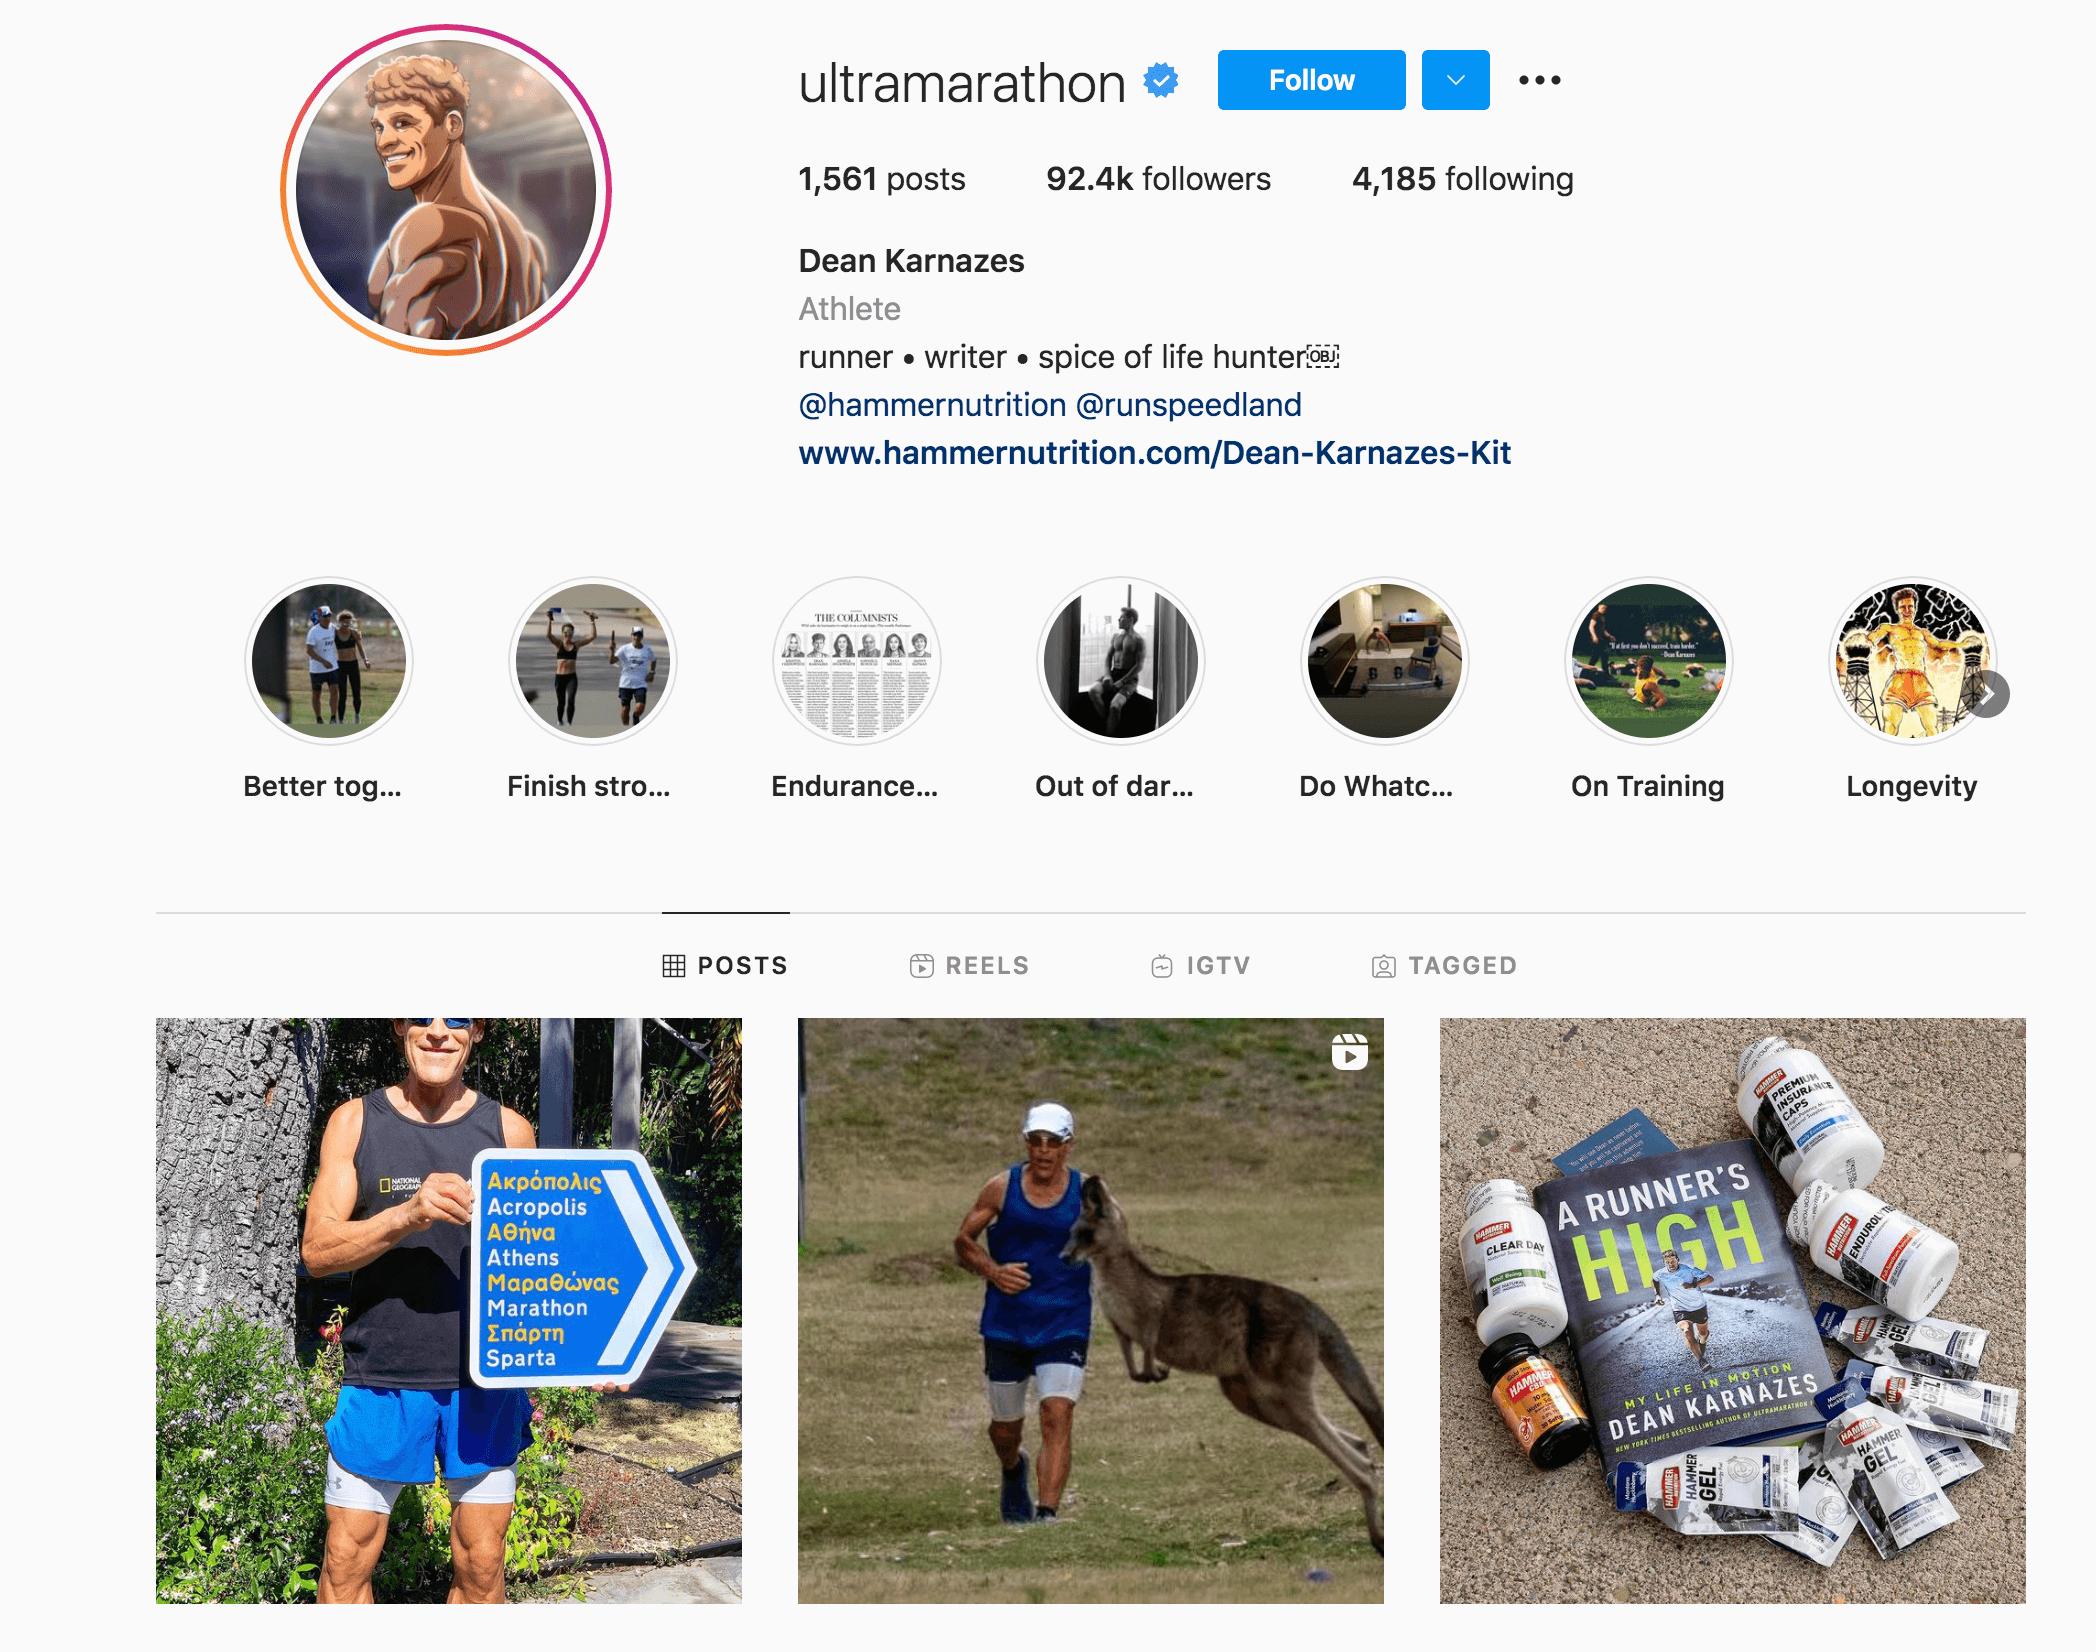 Dean Karnazes Instagram Profile